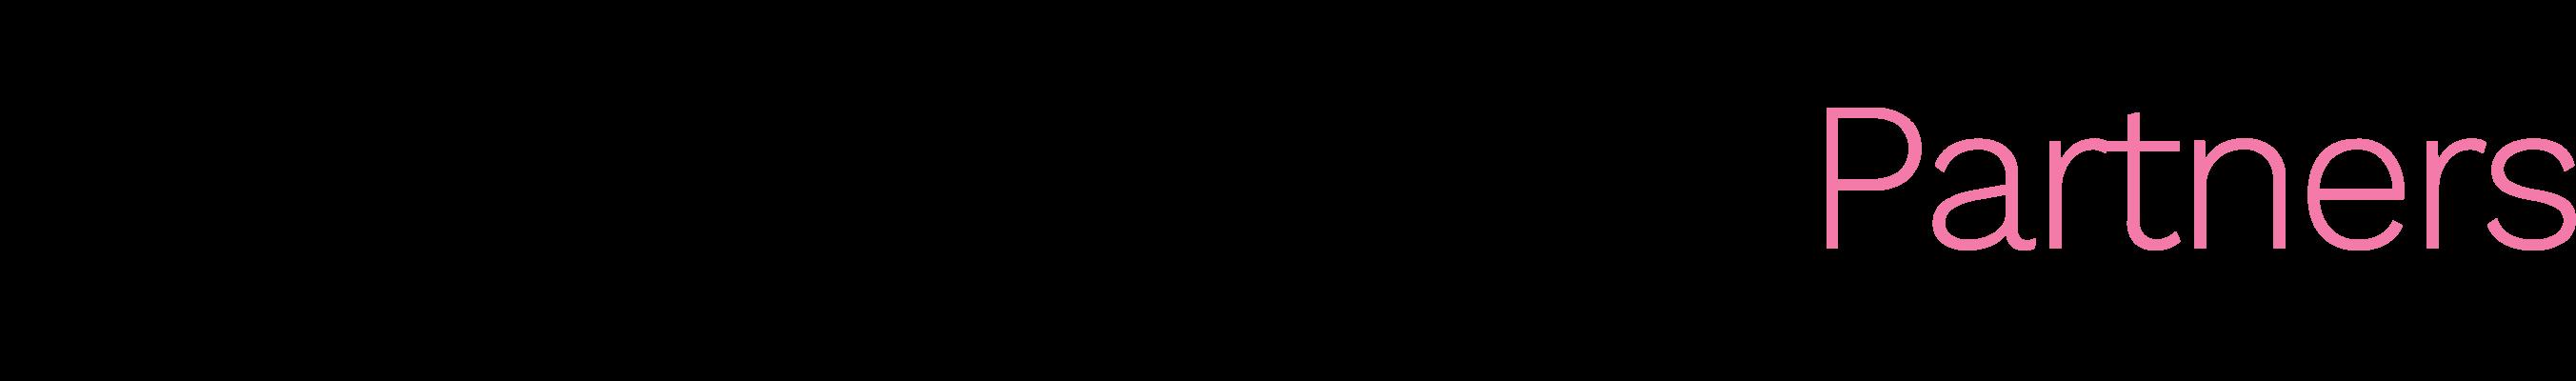 PressEnter Partners